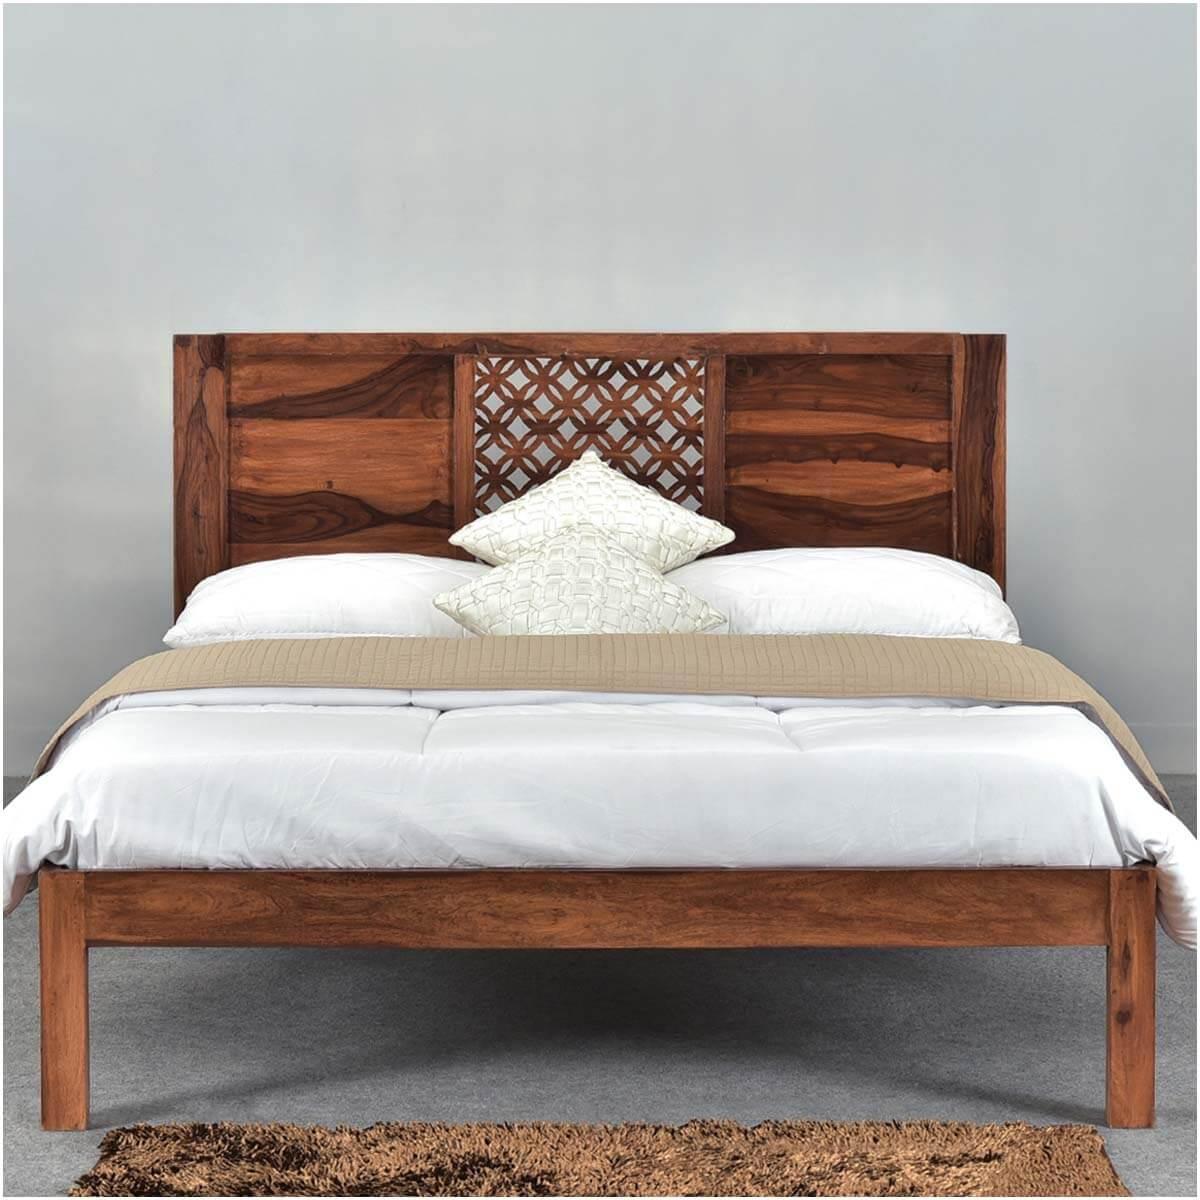 Diamond Lattice Solid Wood Rustic California King Size